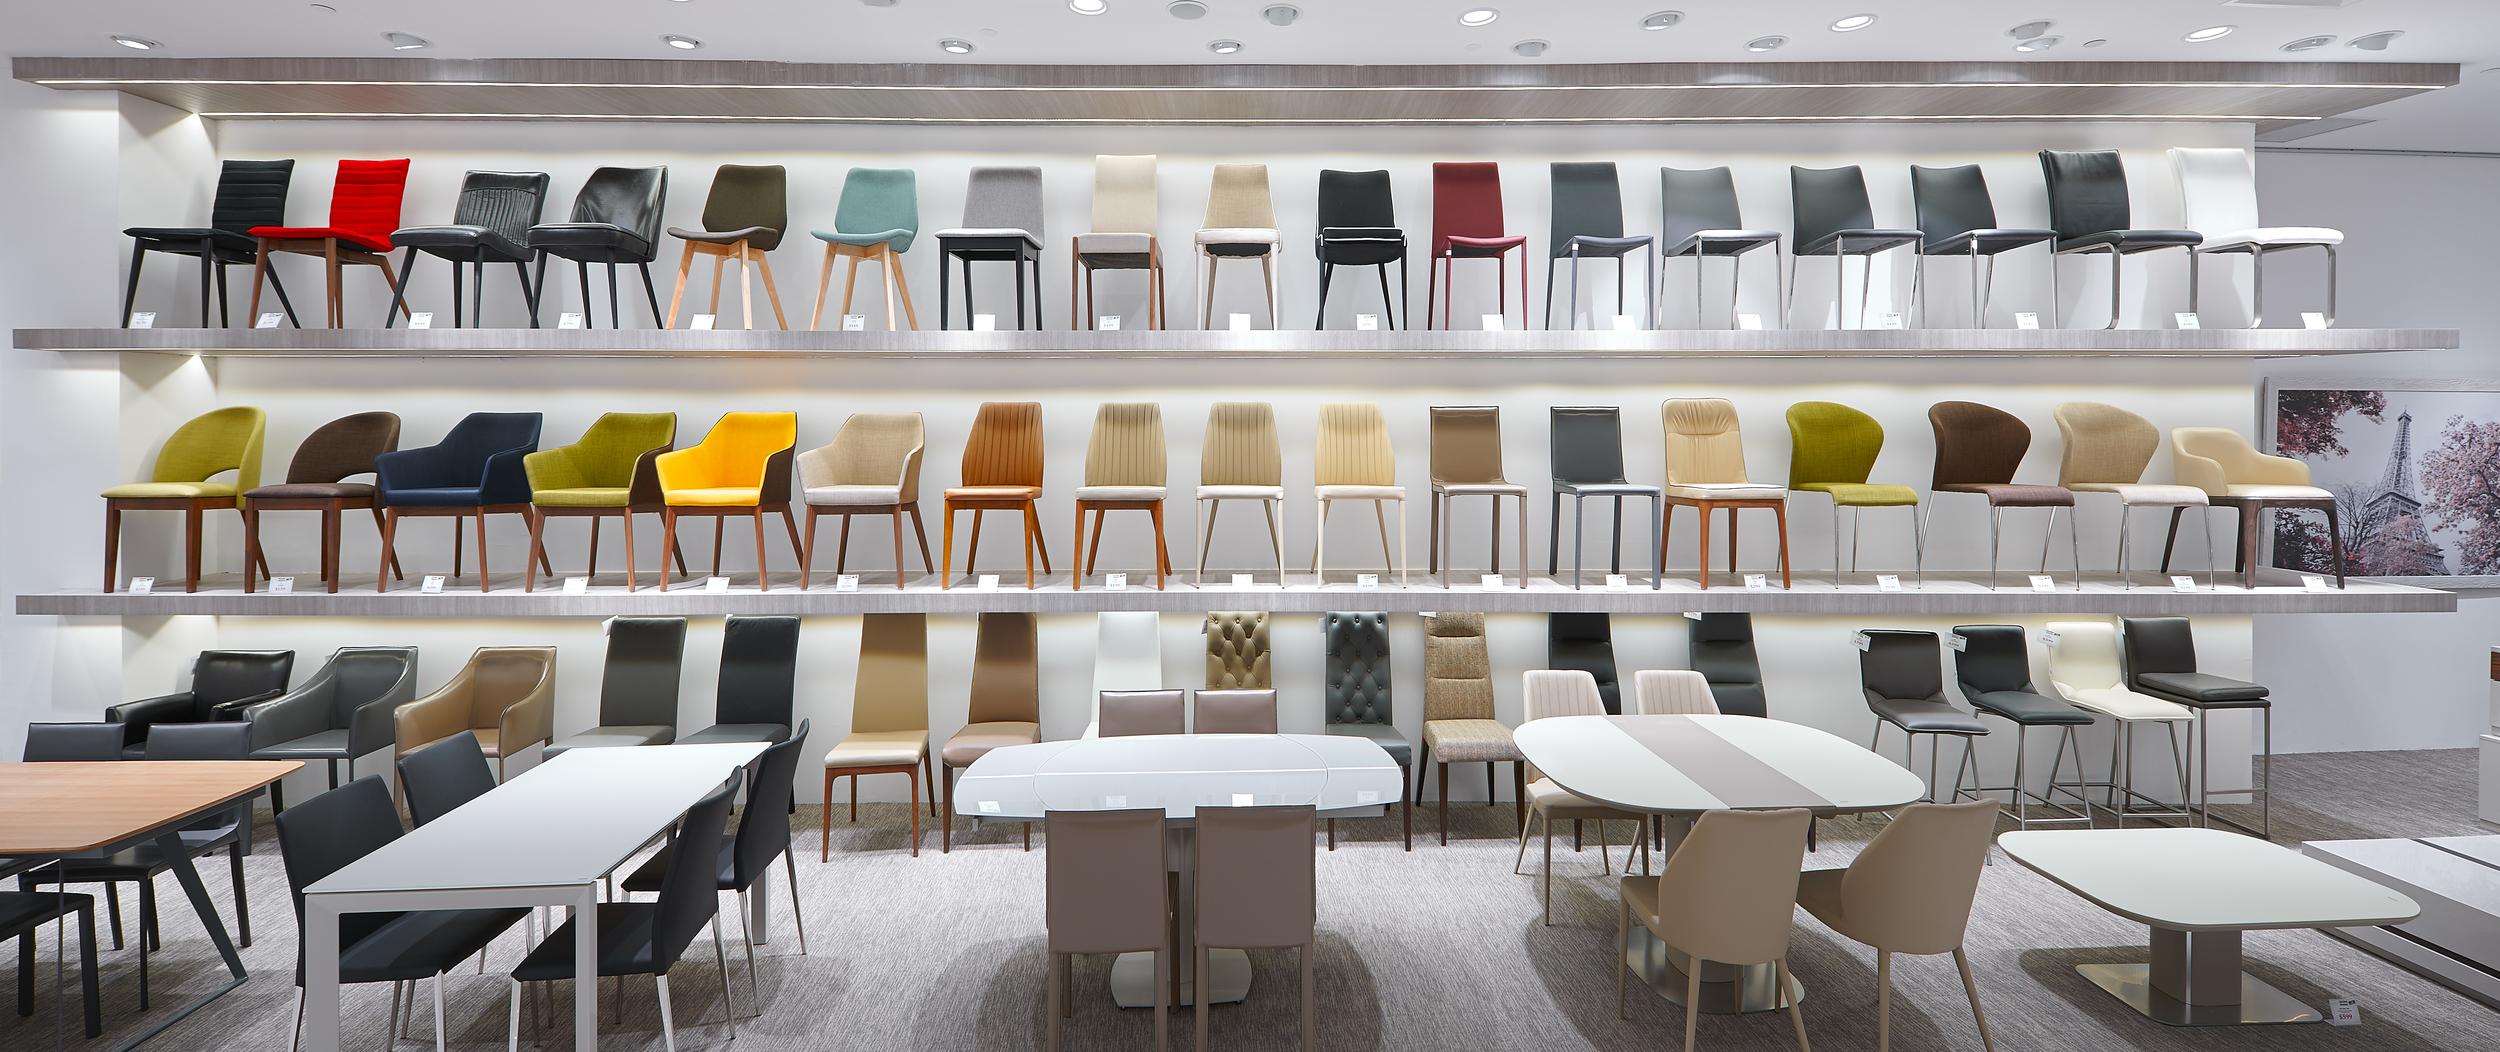 2nd_Furniture_Chairs_1.jpg